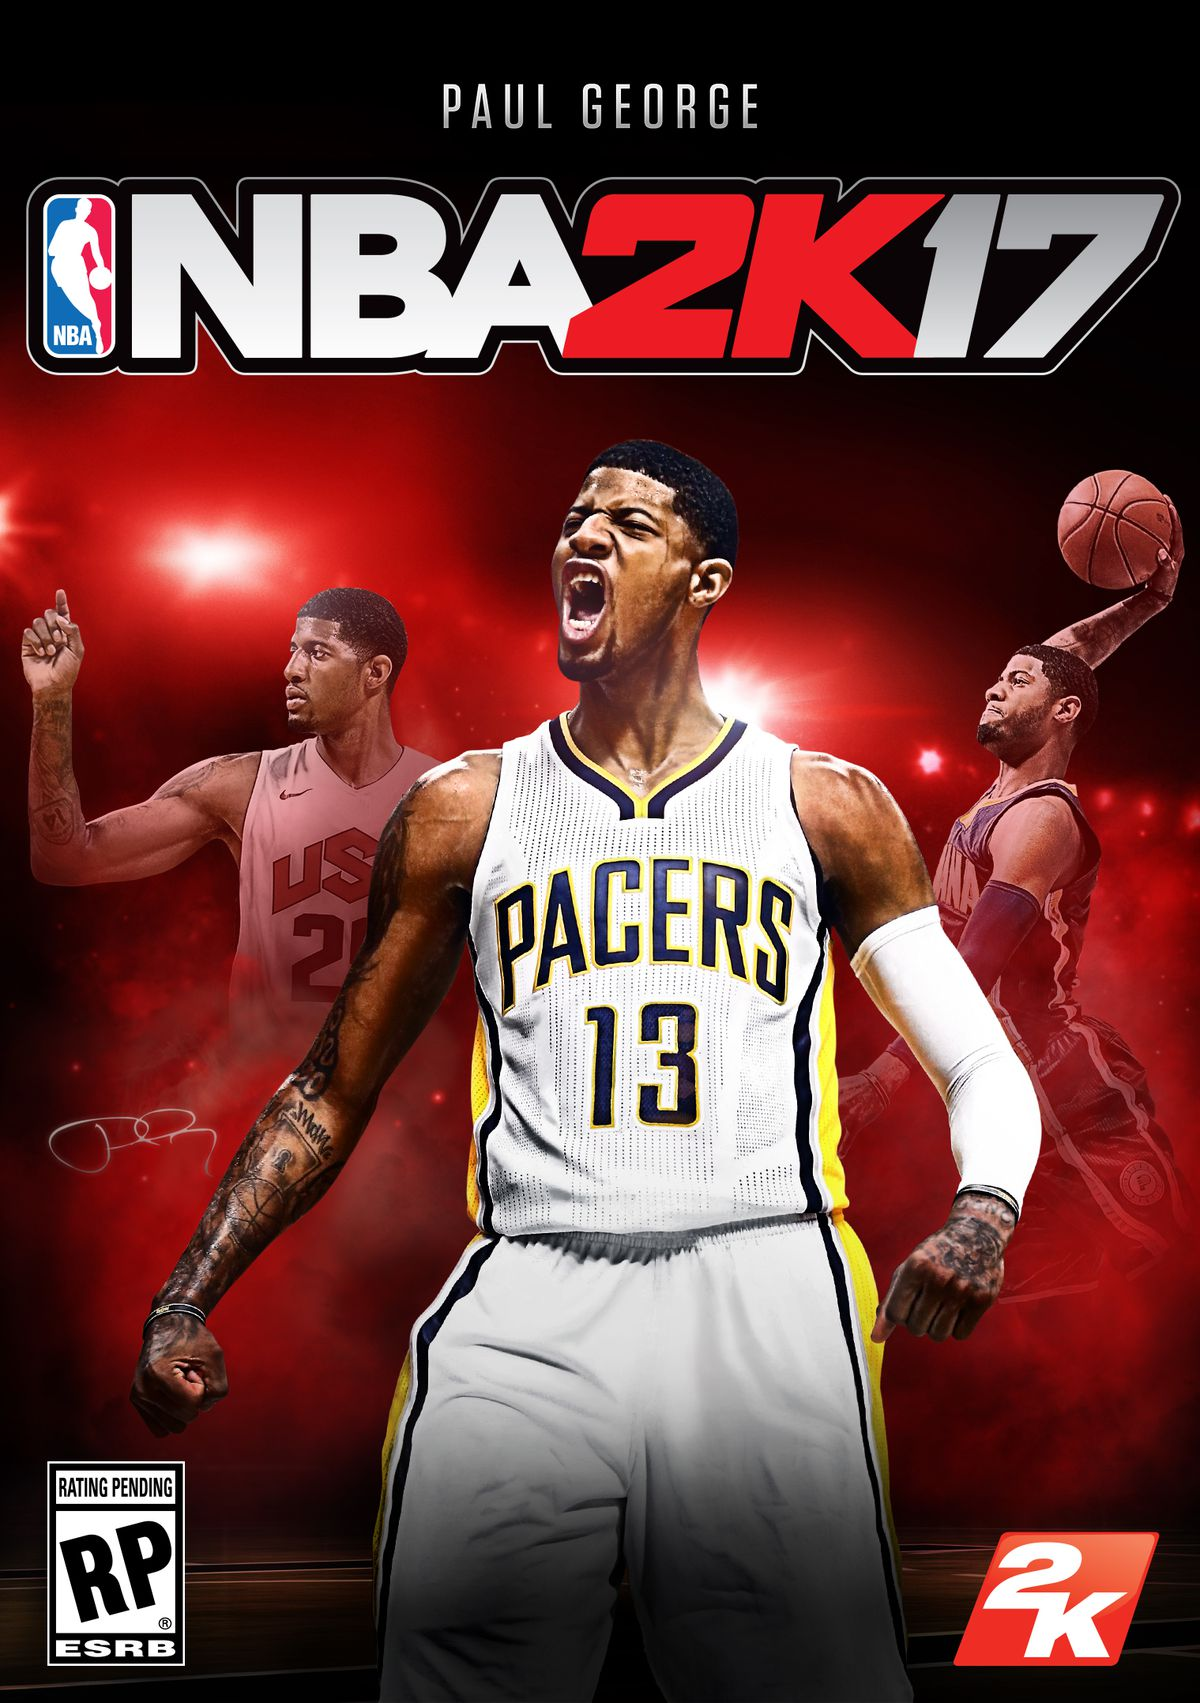 Paul George NBA 2K17